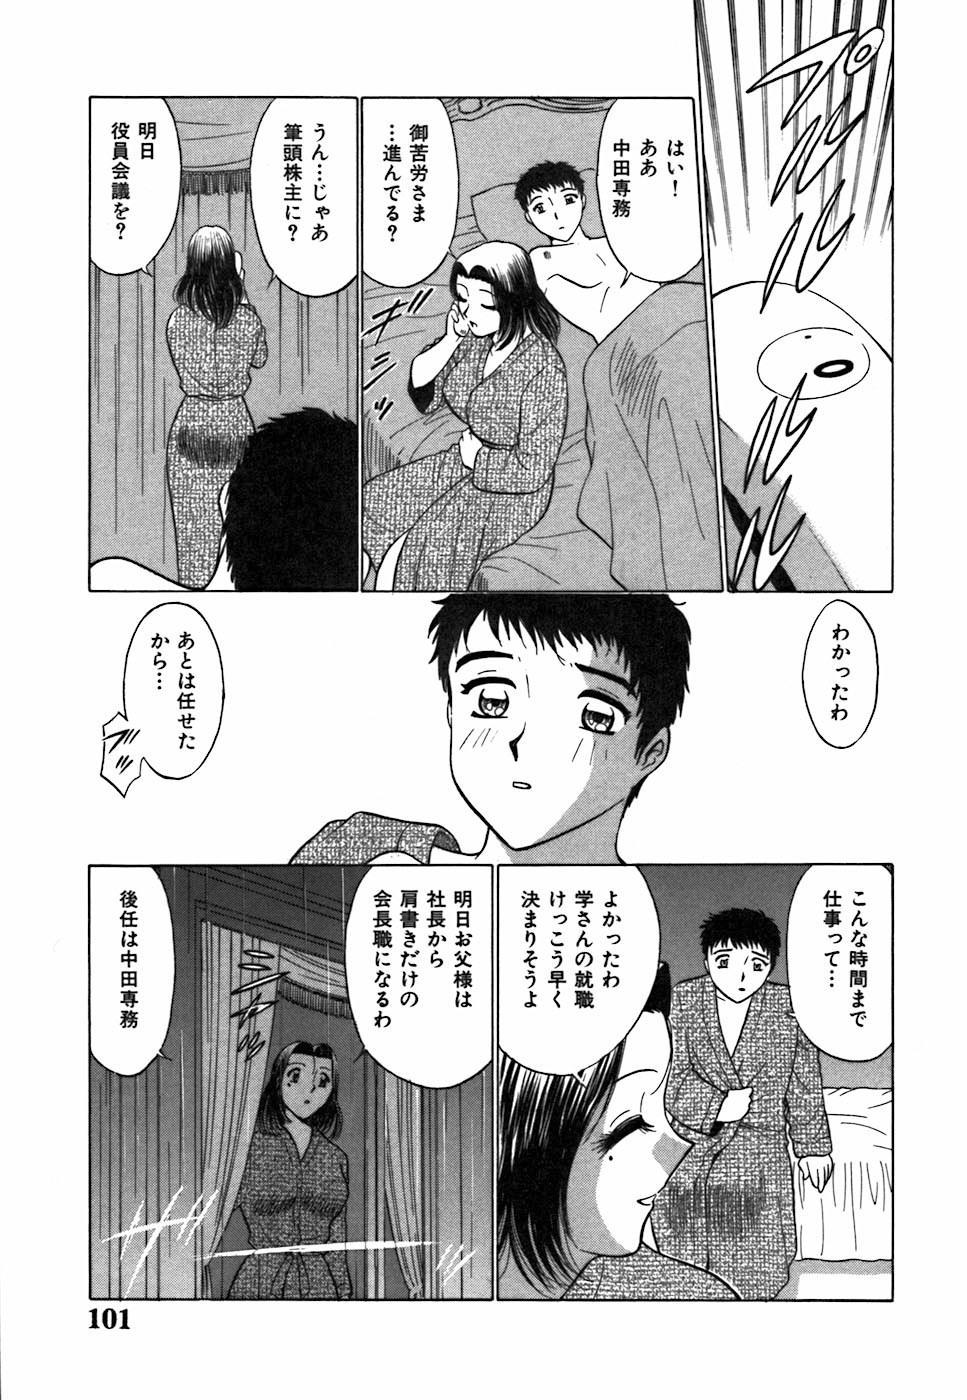 Kimi ga Nozomu Katachi | Appearance for which you hope 100